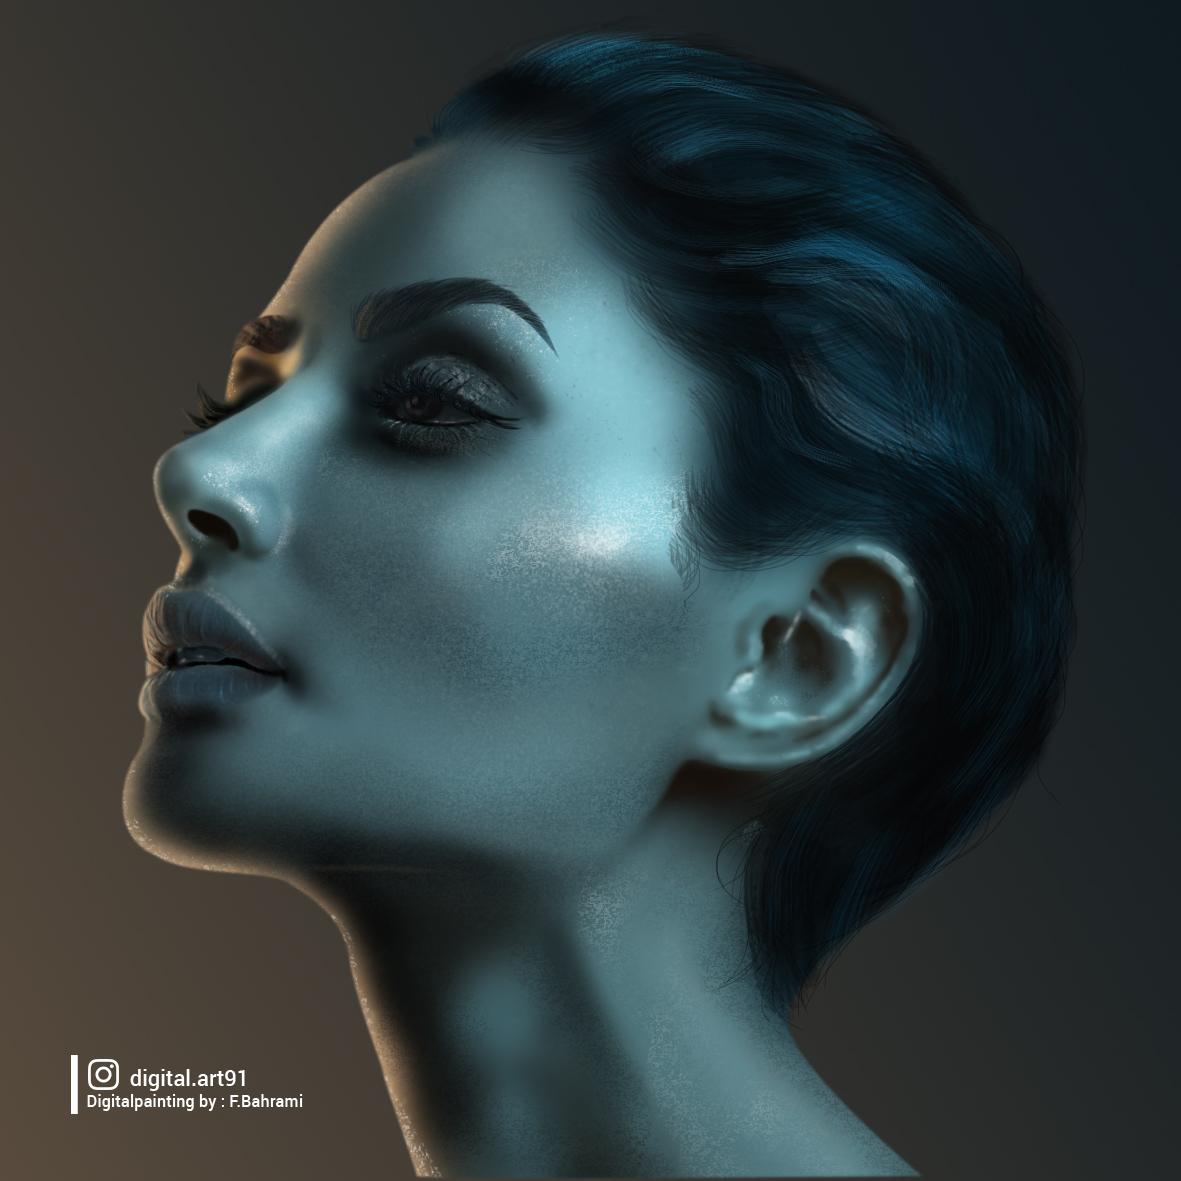 Digital painting3